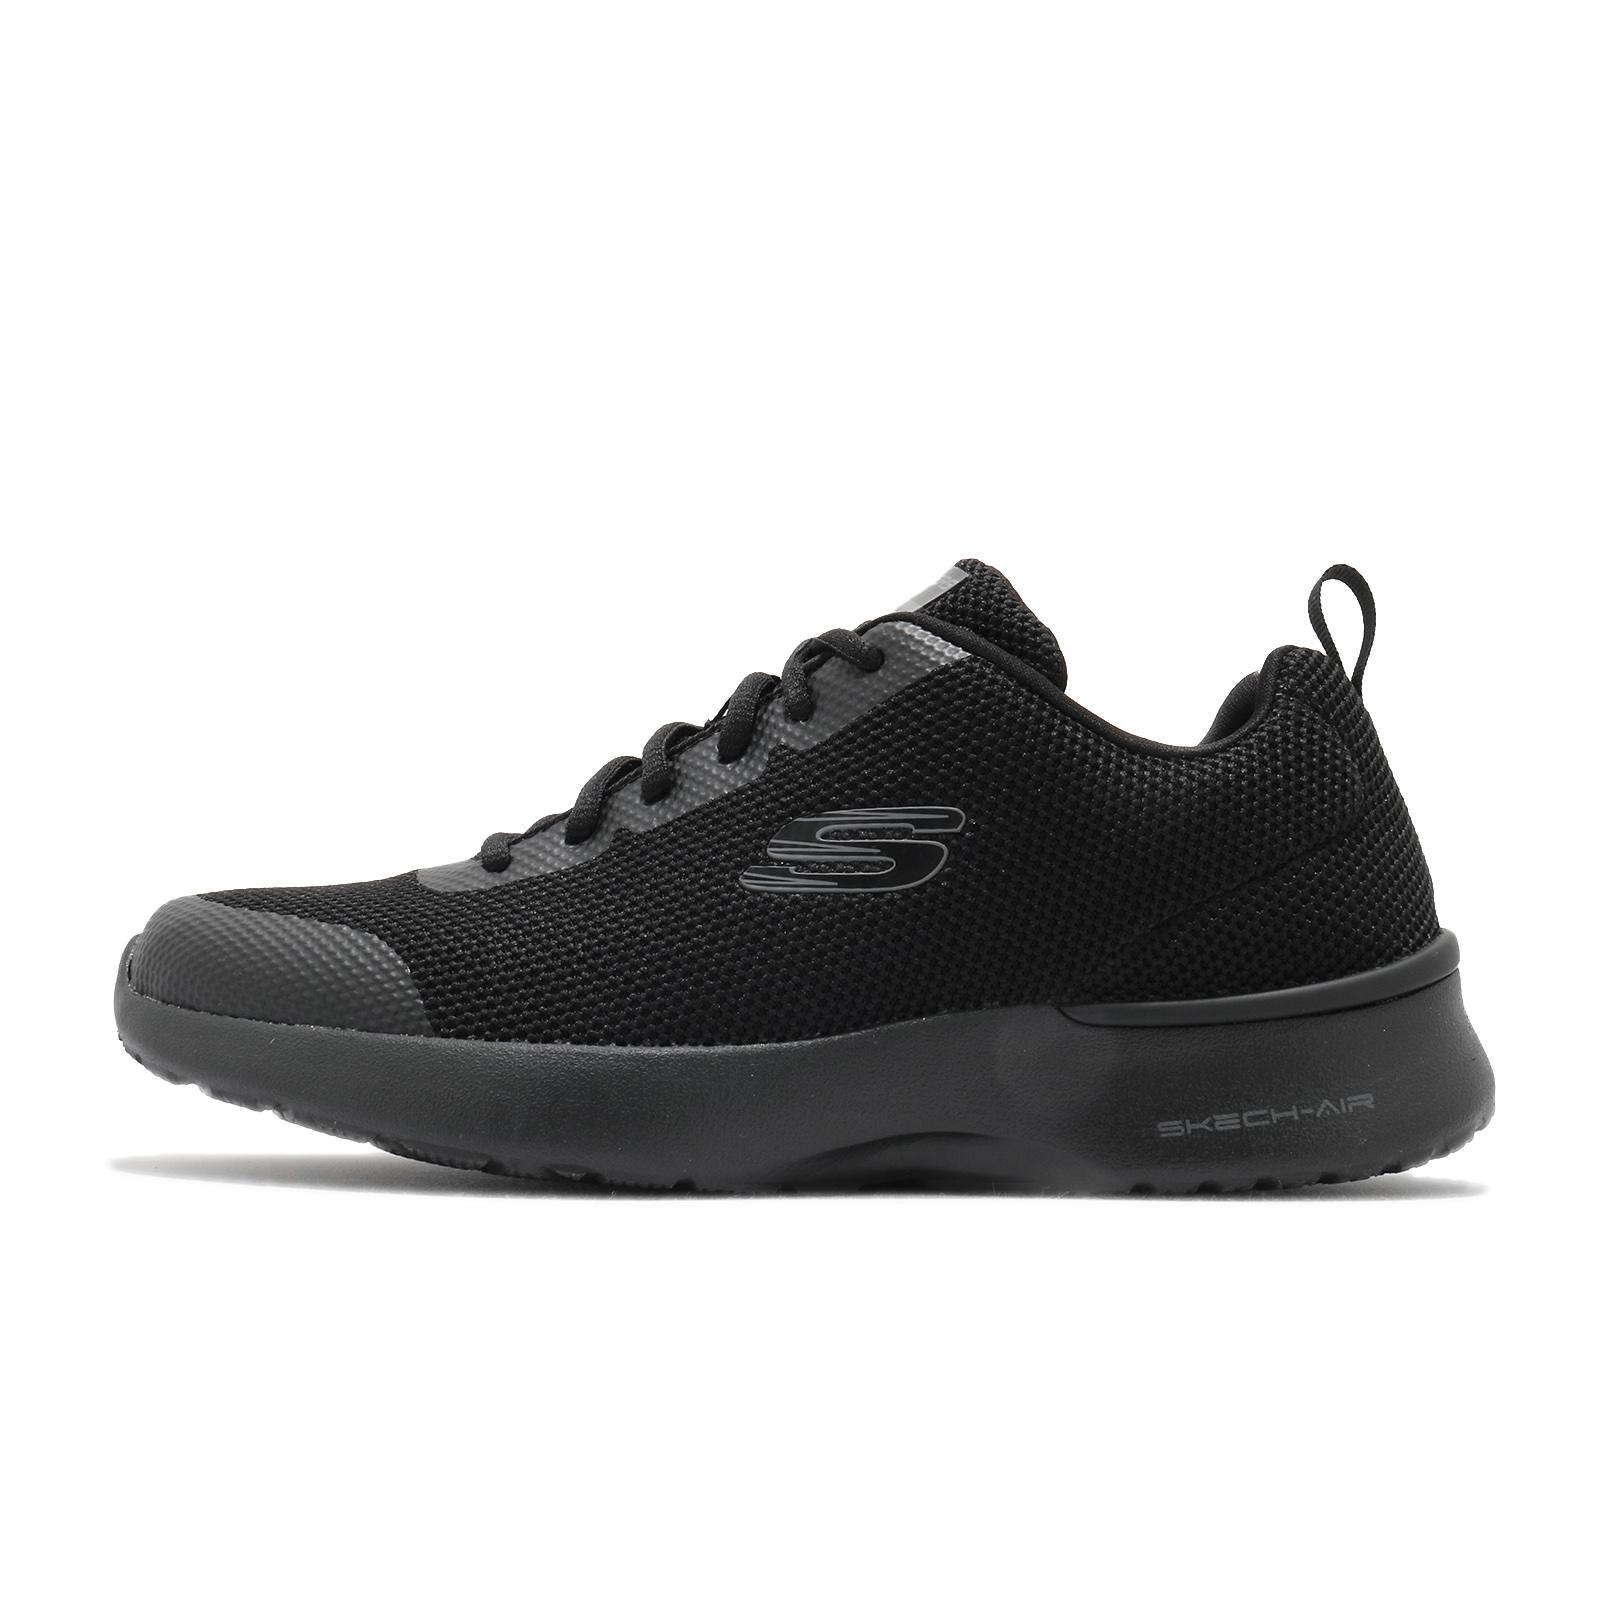 Skechers 慢跑鞋 Skech-Air Dynamight 男鞋 黑 輕量 運動鞋 【ACS】 232007BBK